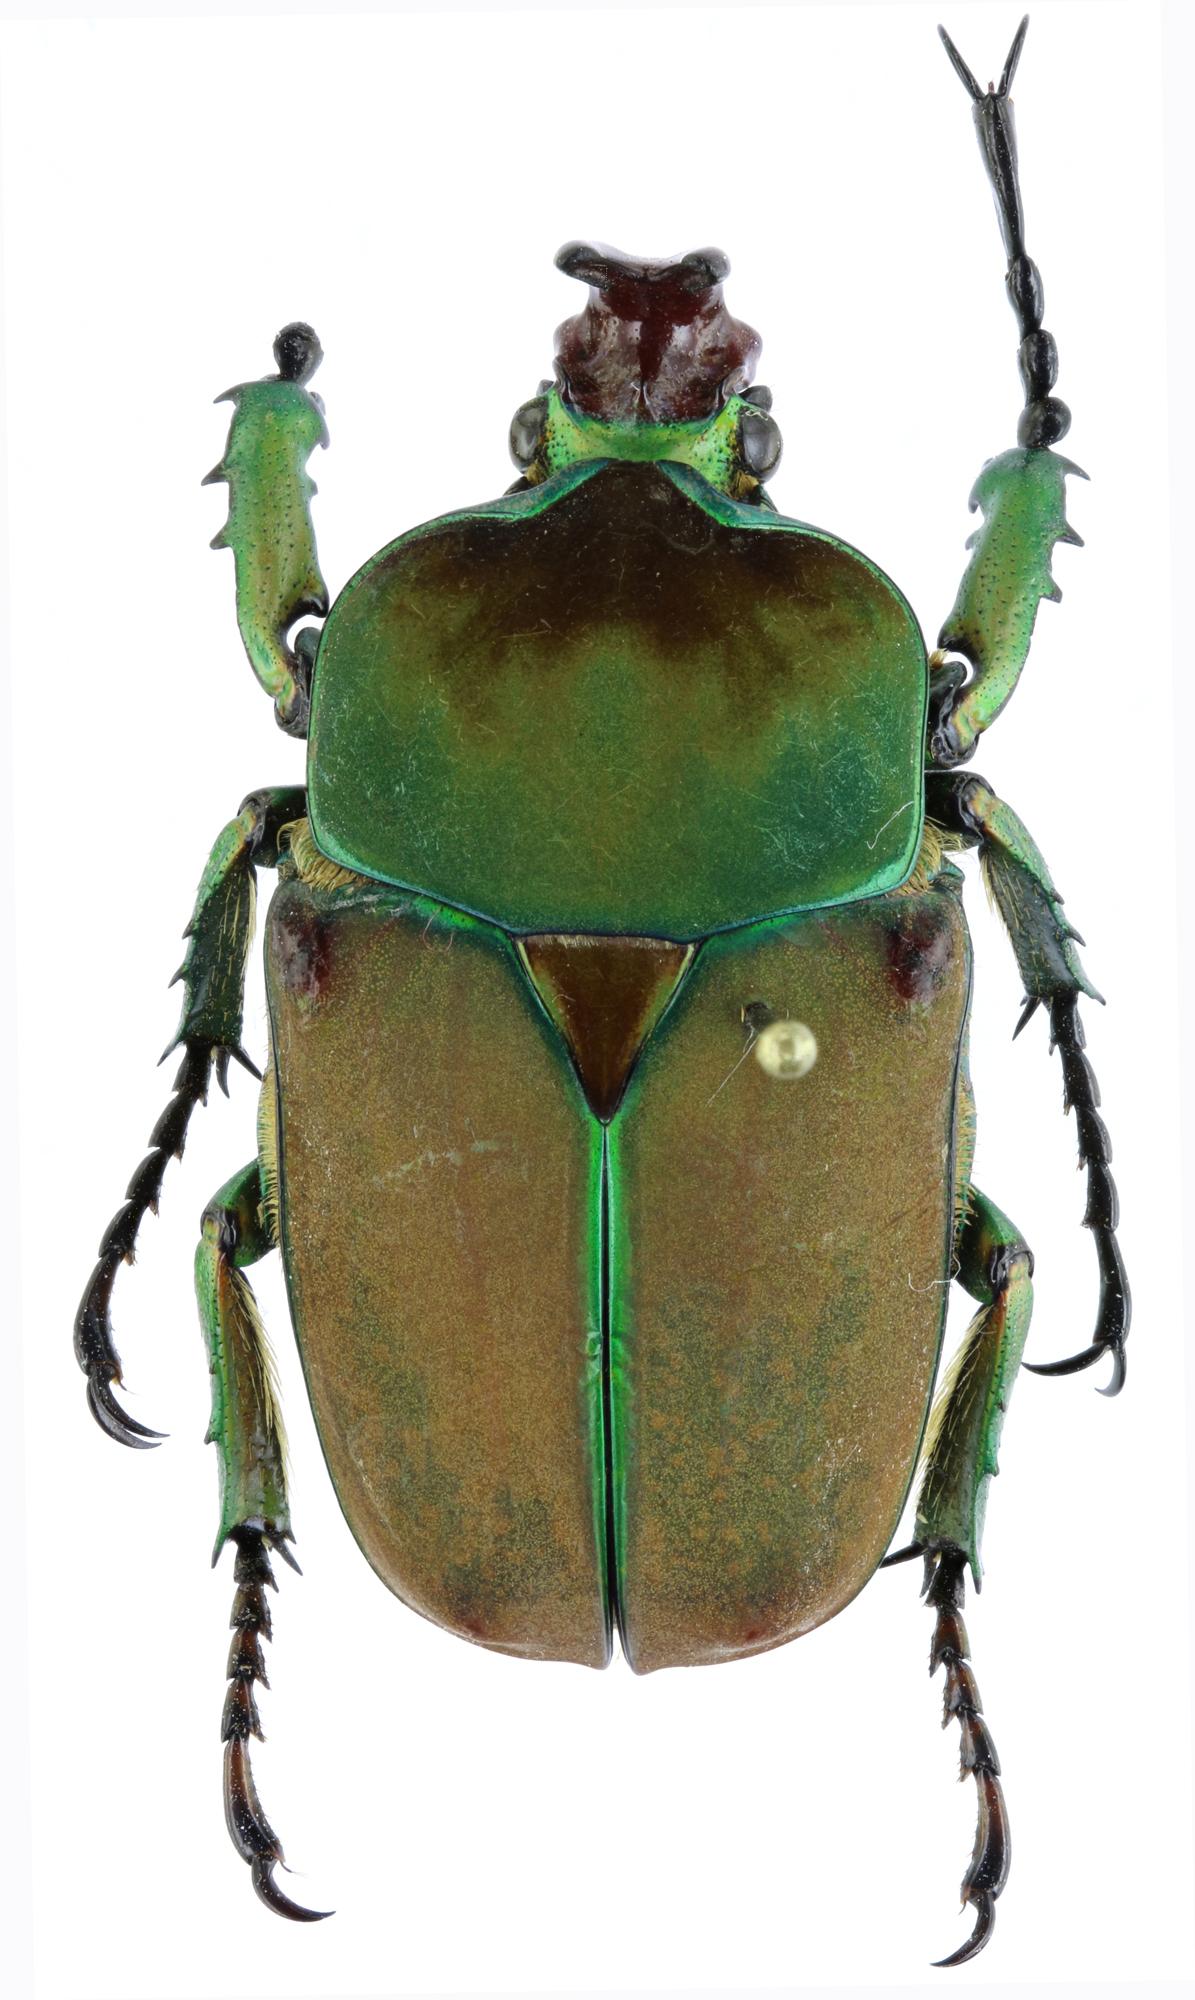 Compsocephalus horsfieldianus noguchii PT 25585zs96.jpg